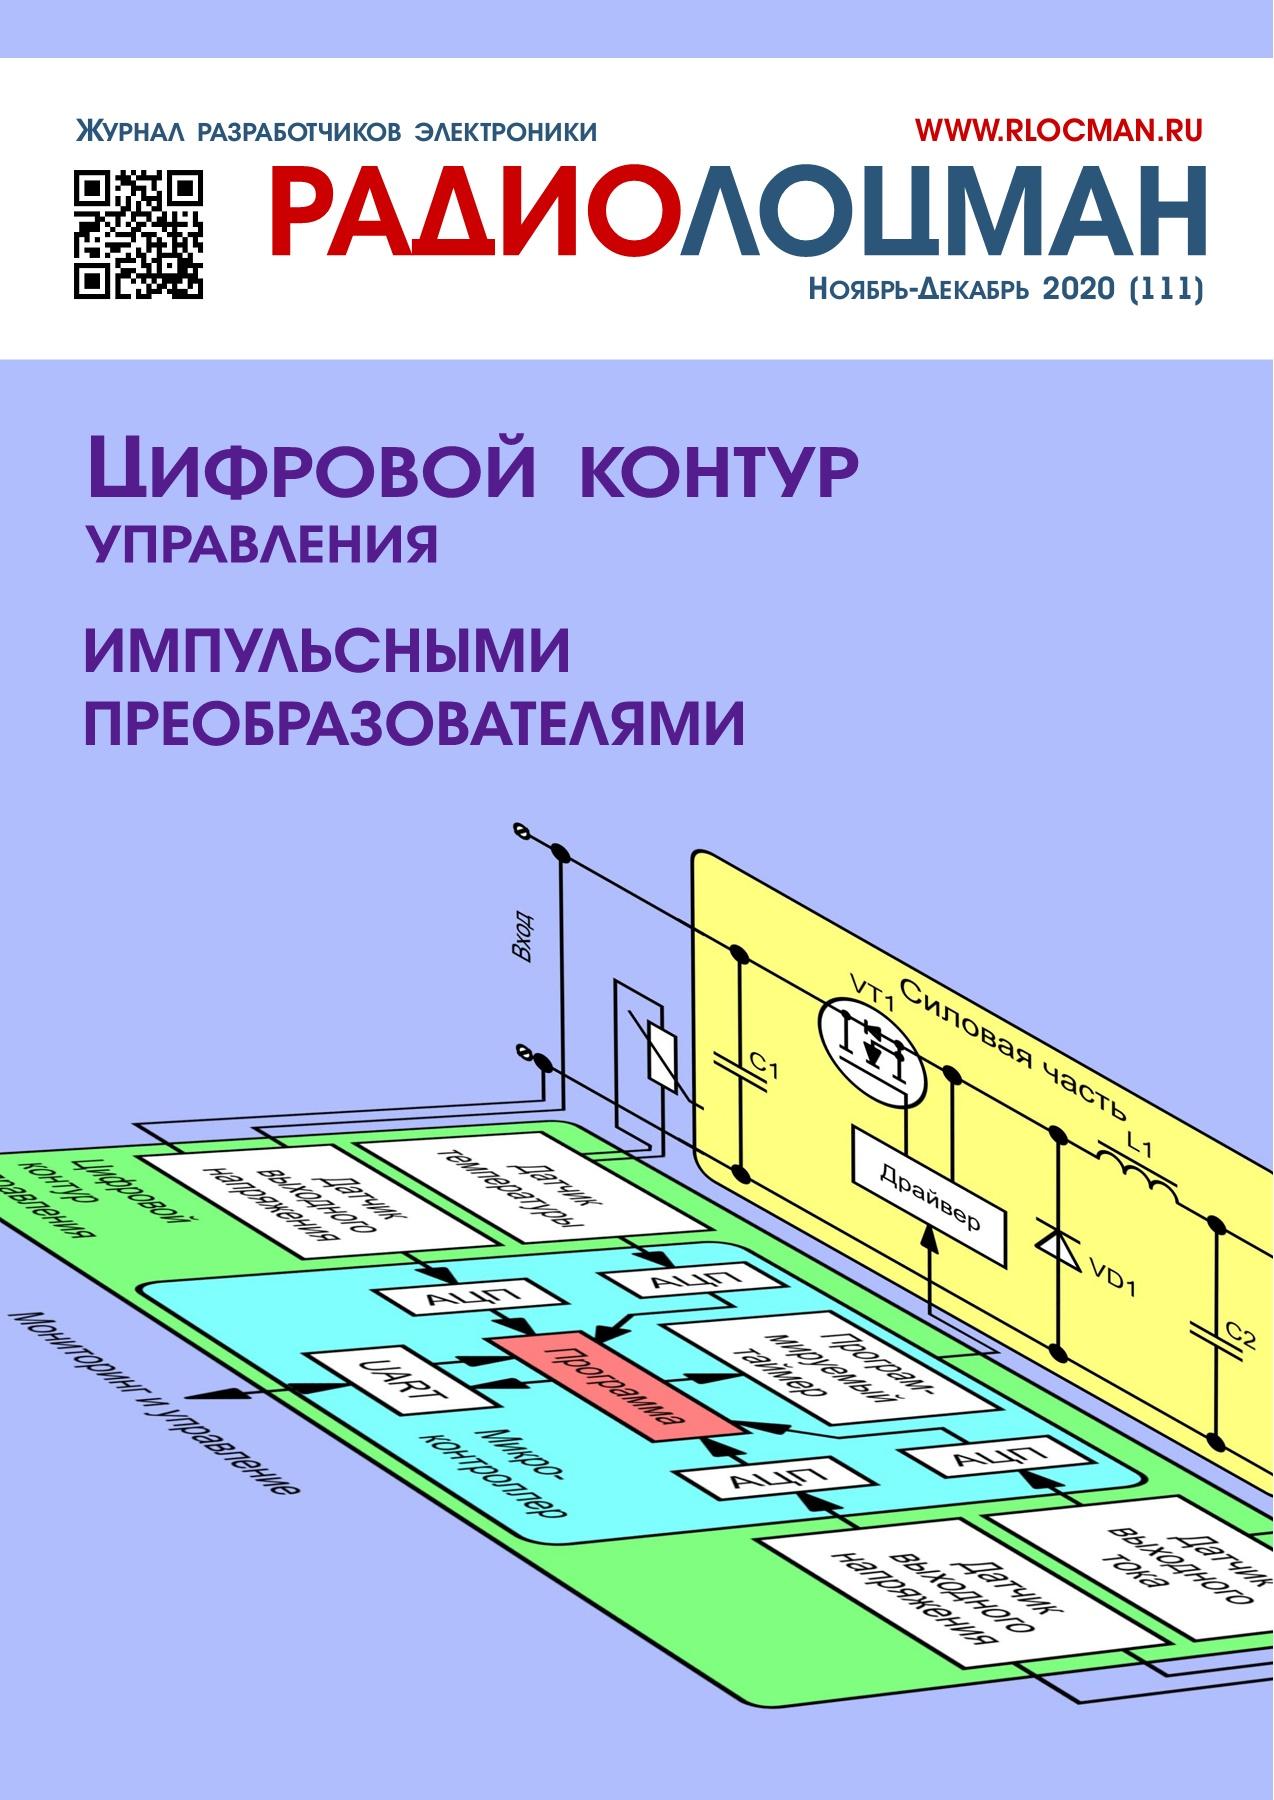 Радиолоцман №11-12, ноябрь - декабрь 2020